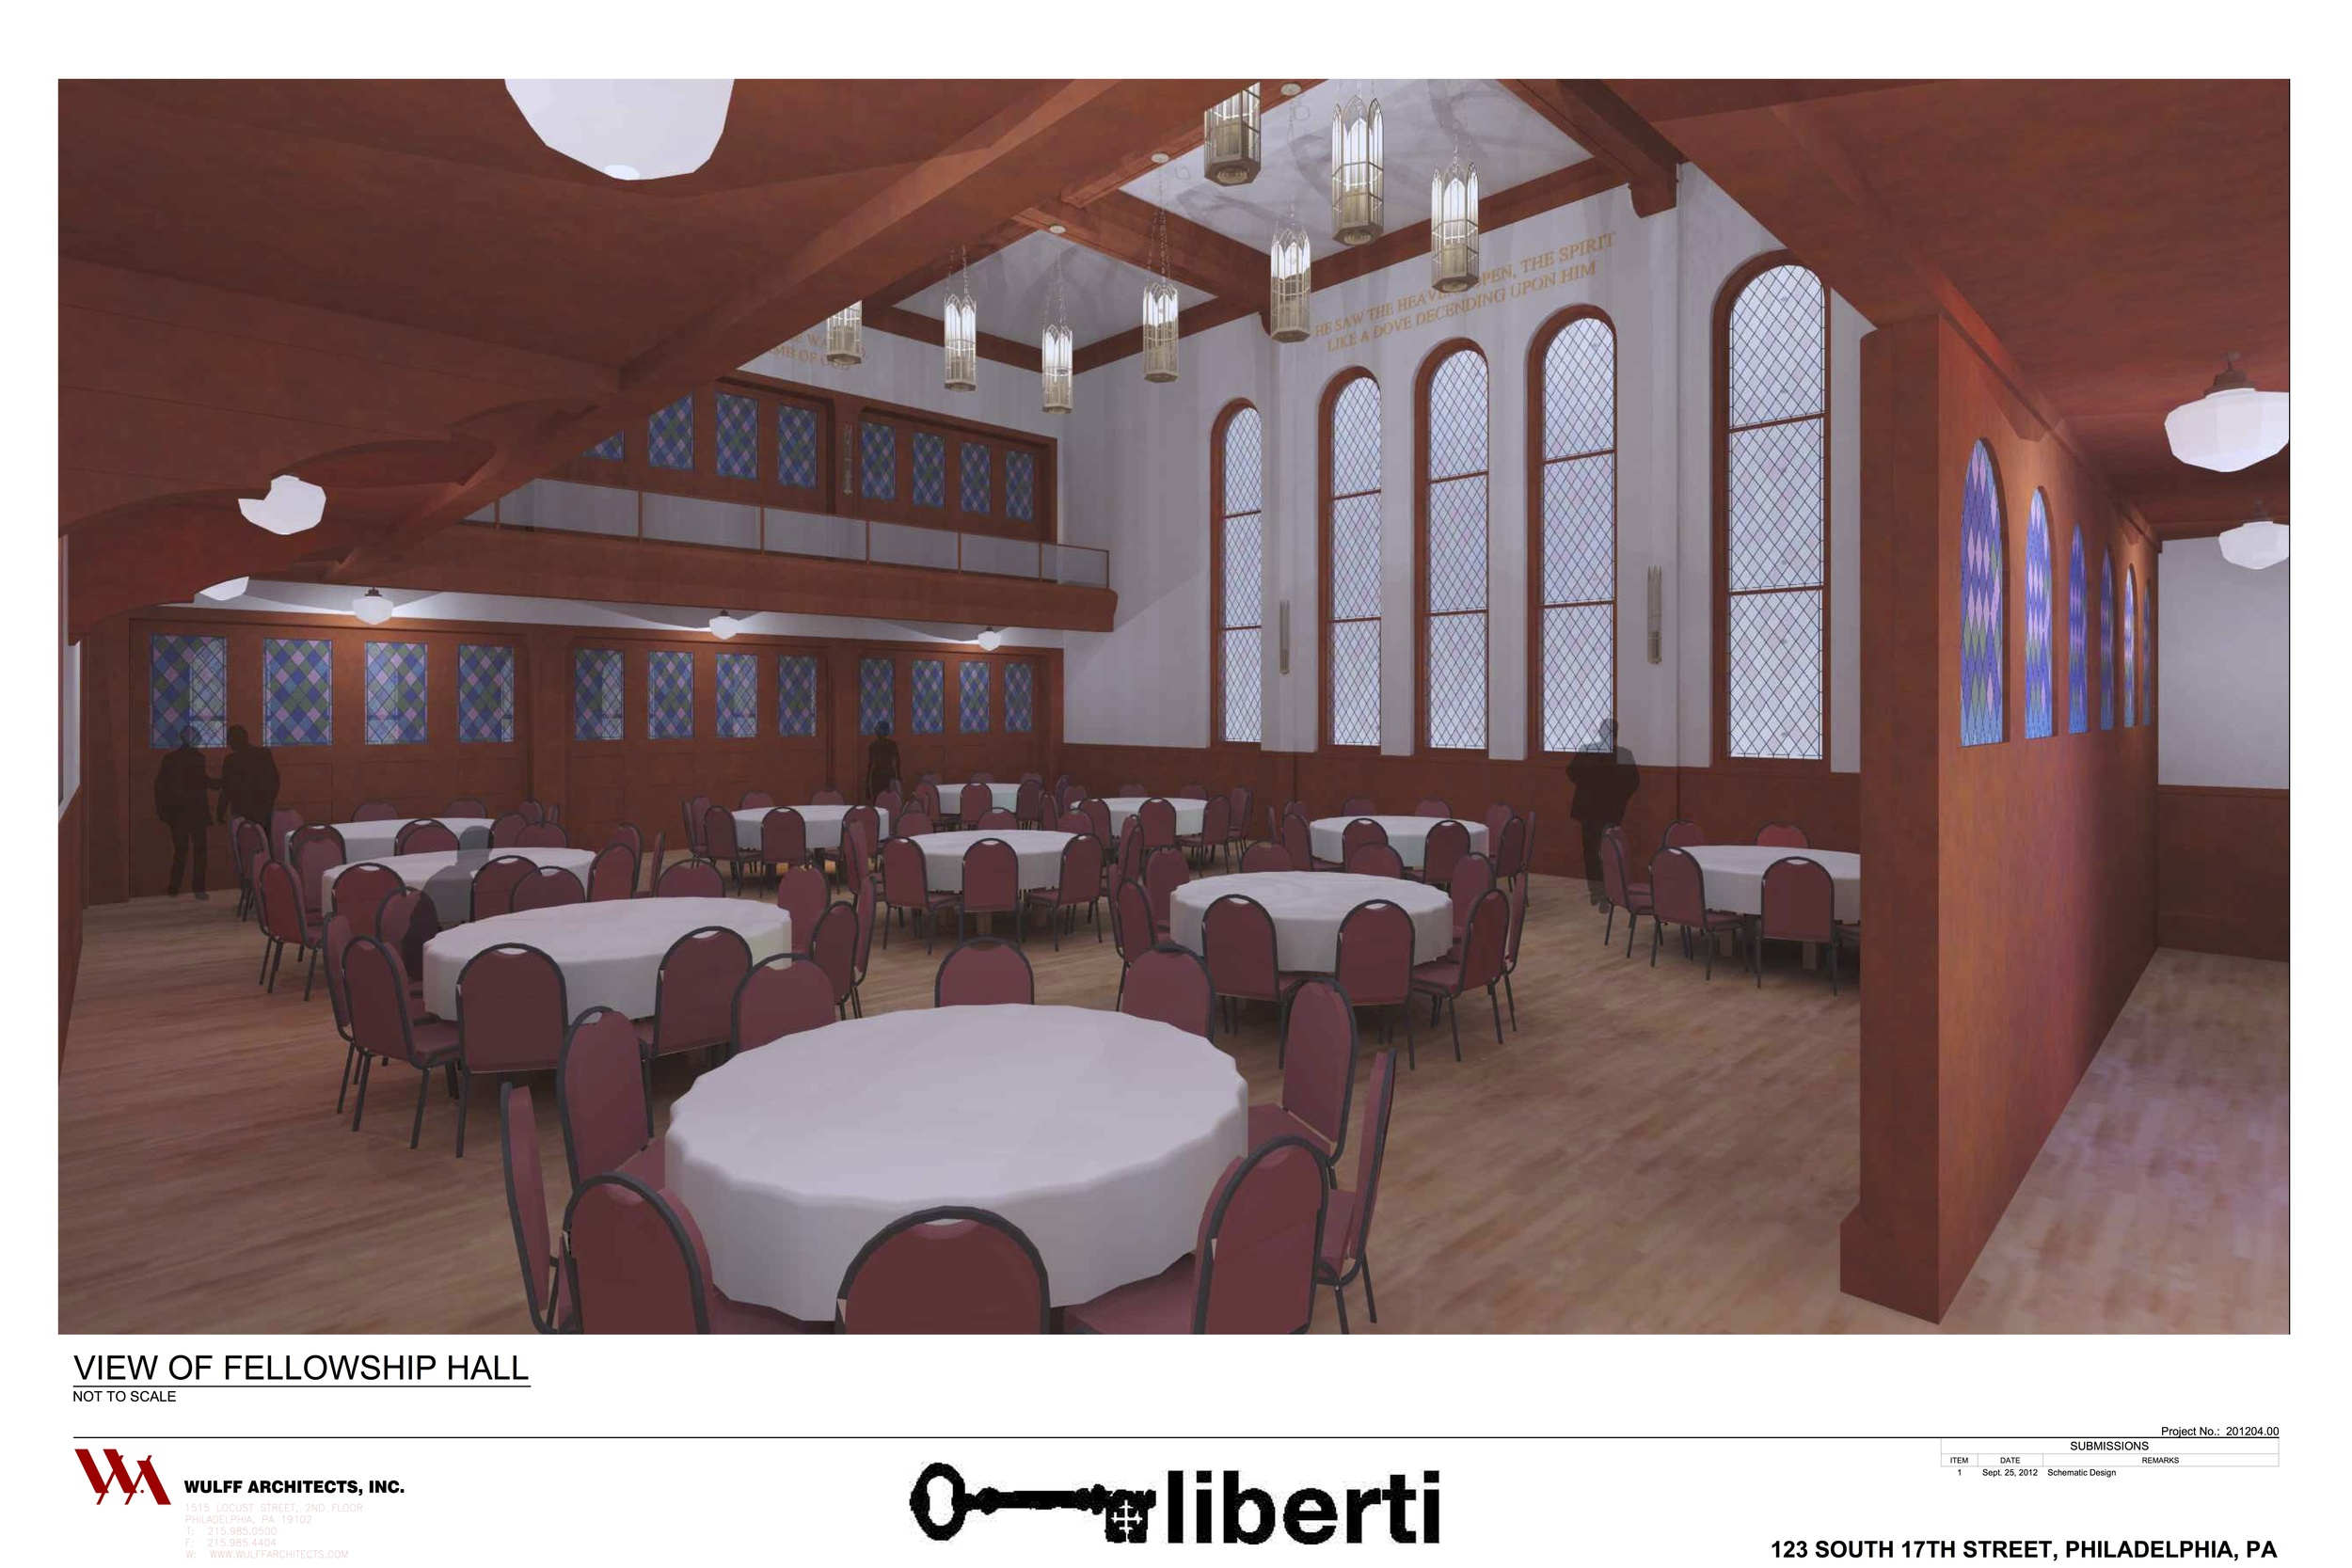 Liberti_Presentation Boards_Final, 09-25-14_02.jpg